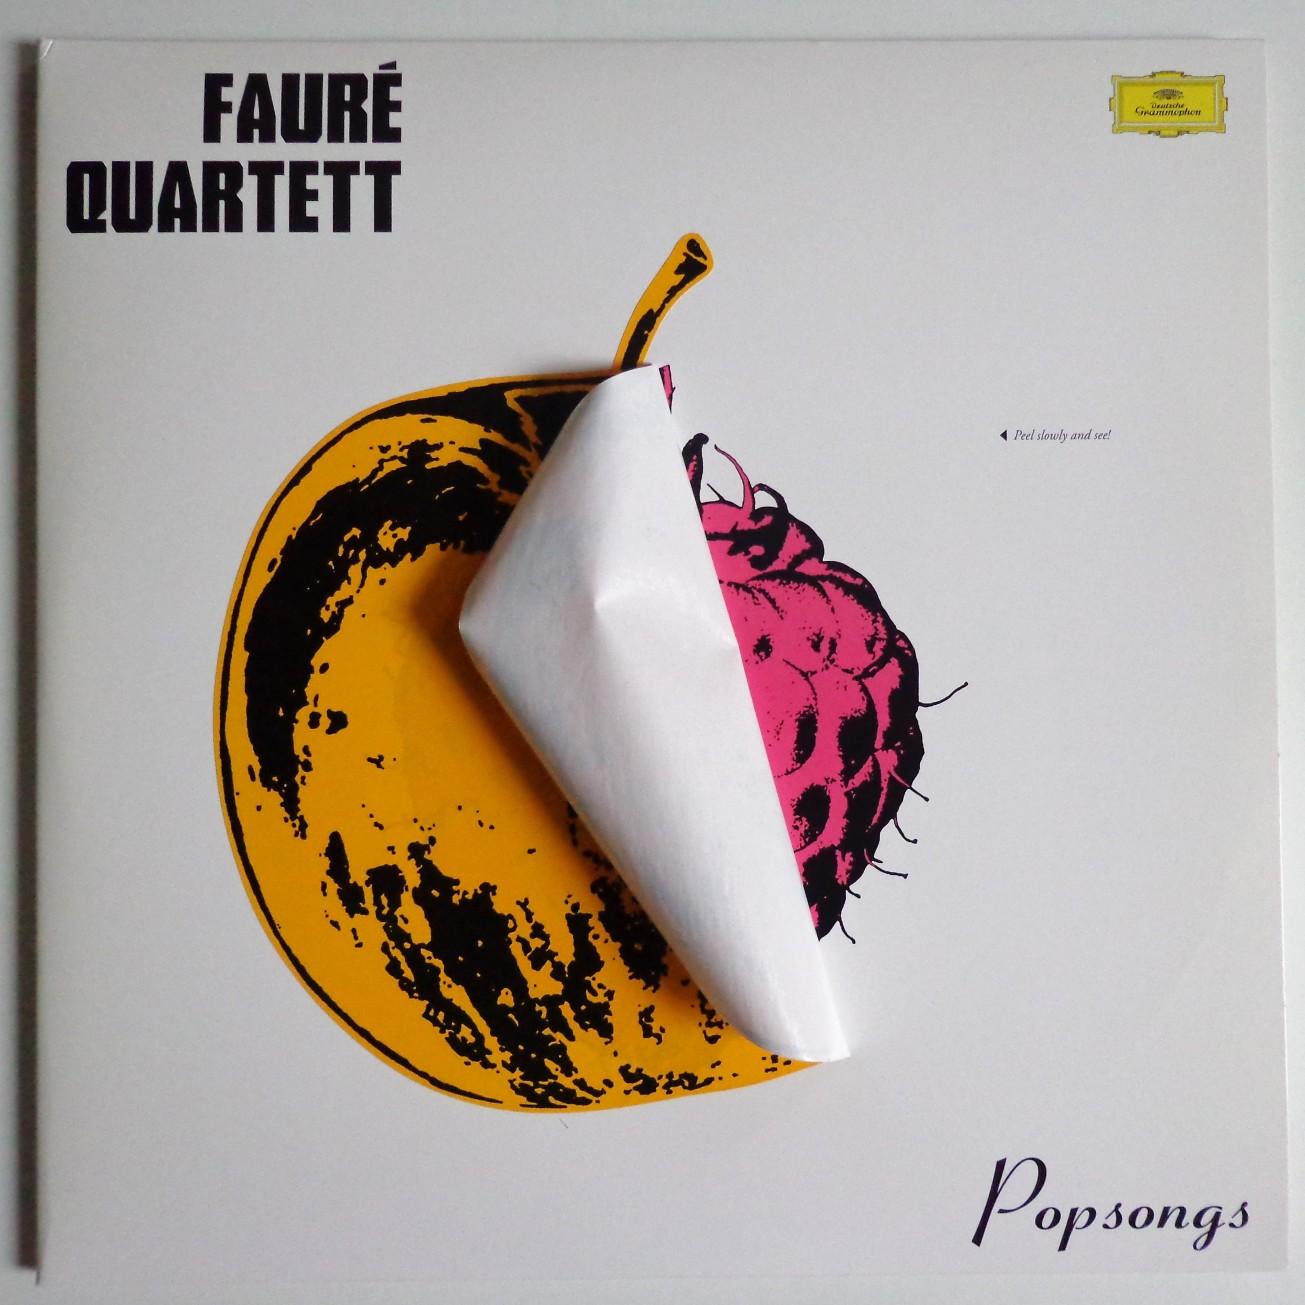 Faure Quartett 2